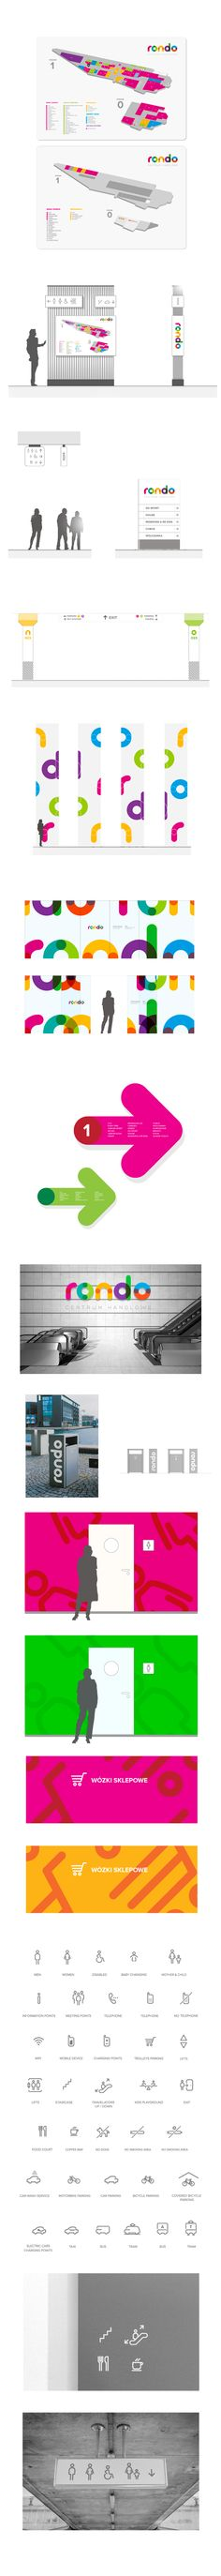 shopping mall RONDO re-branding on Behance